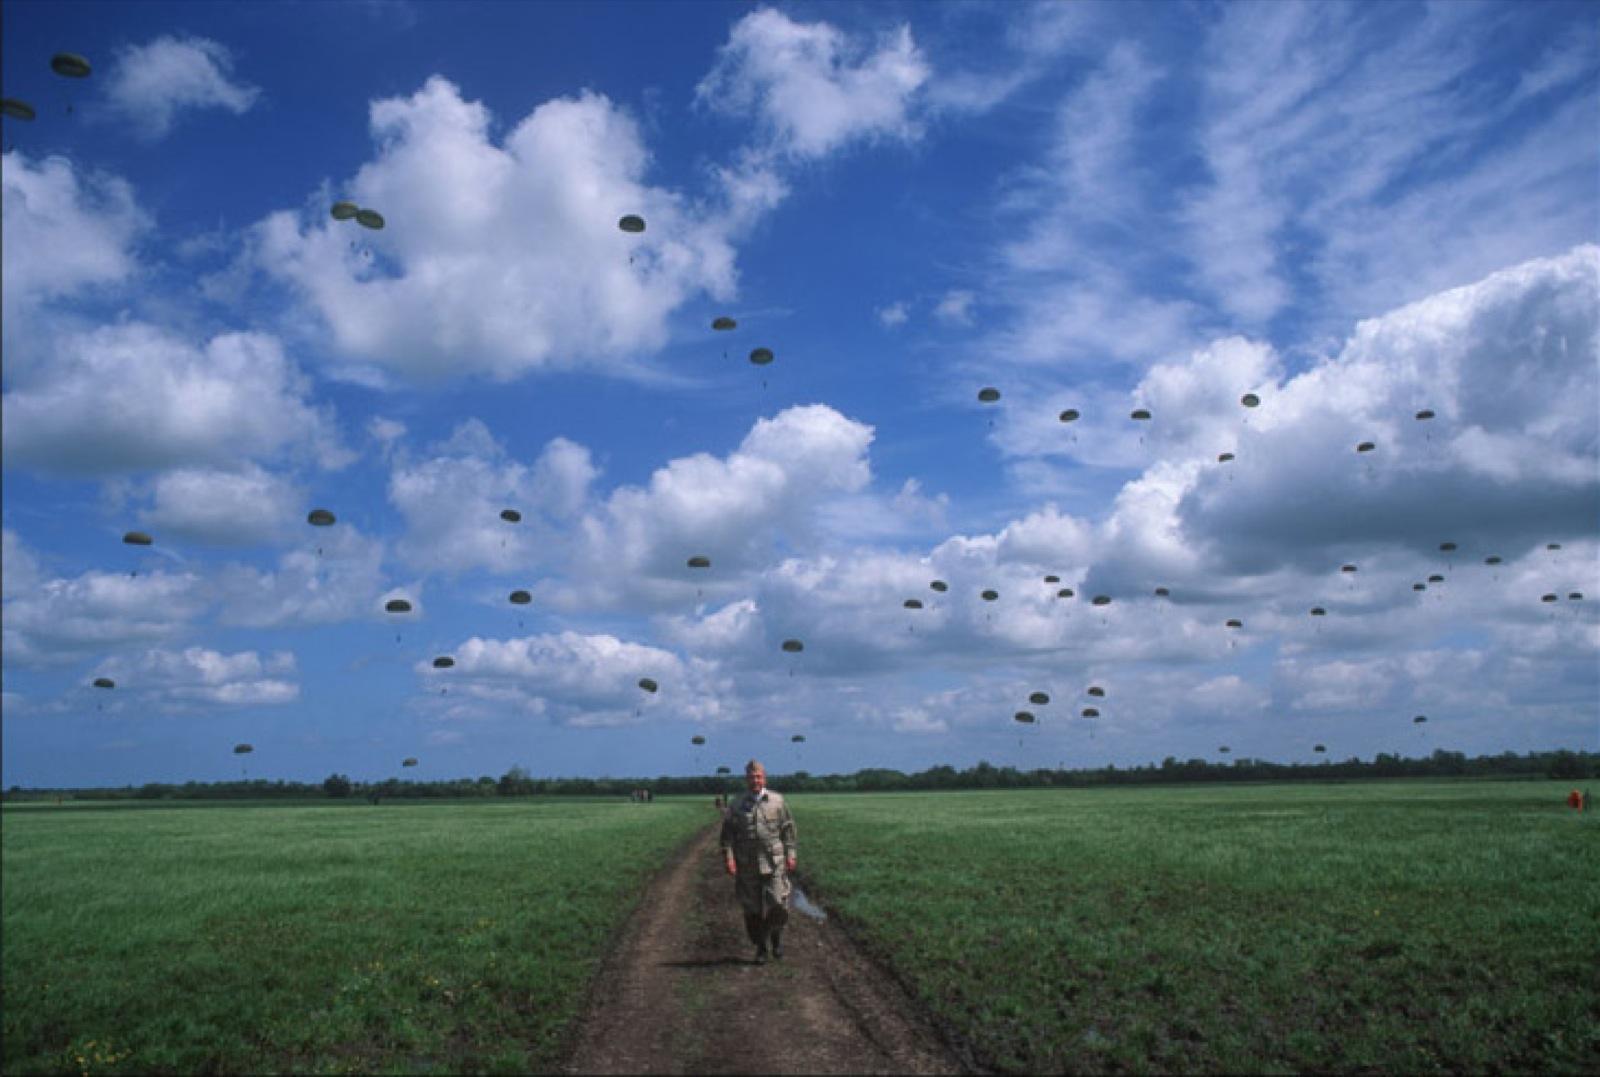 Paratroop veterans jump near Sainte-Mere l'Eglise, during 50th anniversary celebration, 1994. David Burnett/Contact Press Images